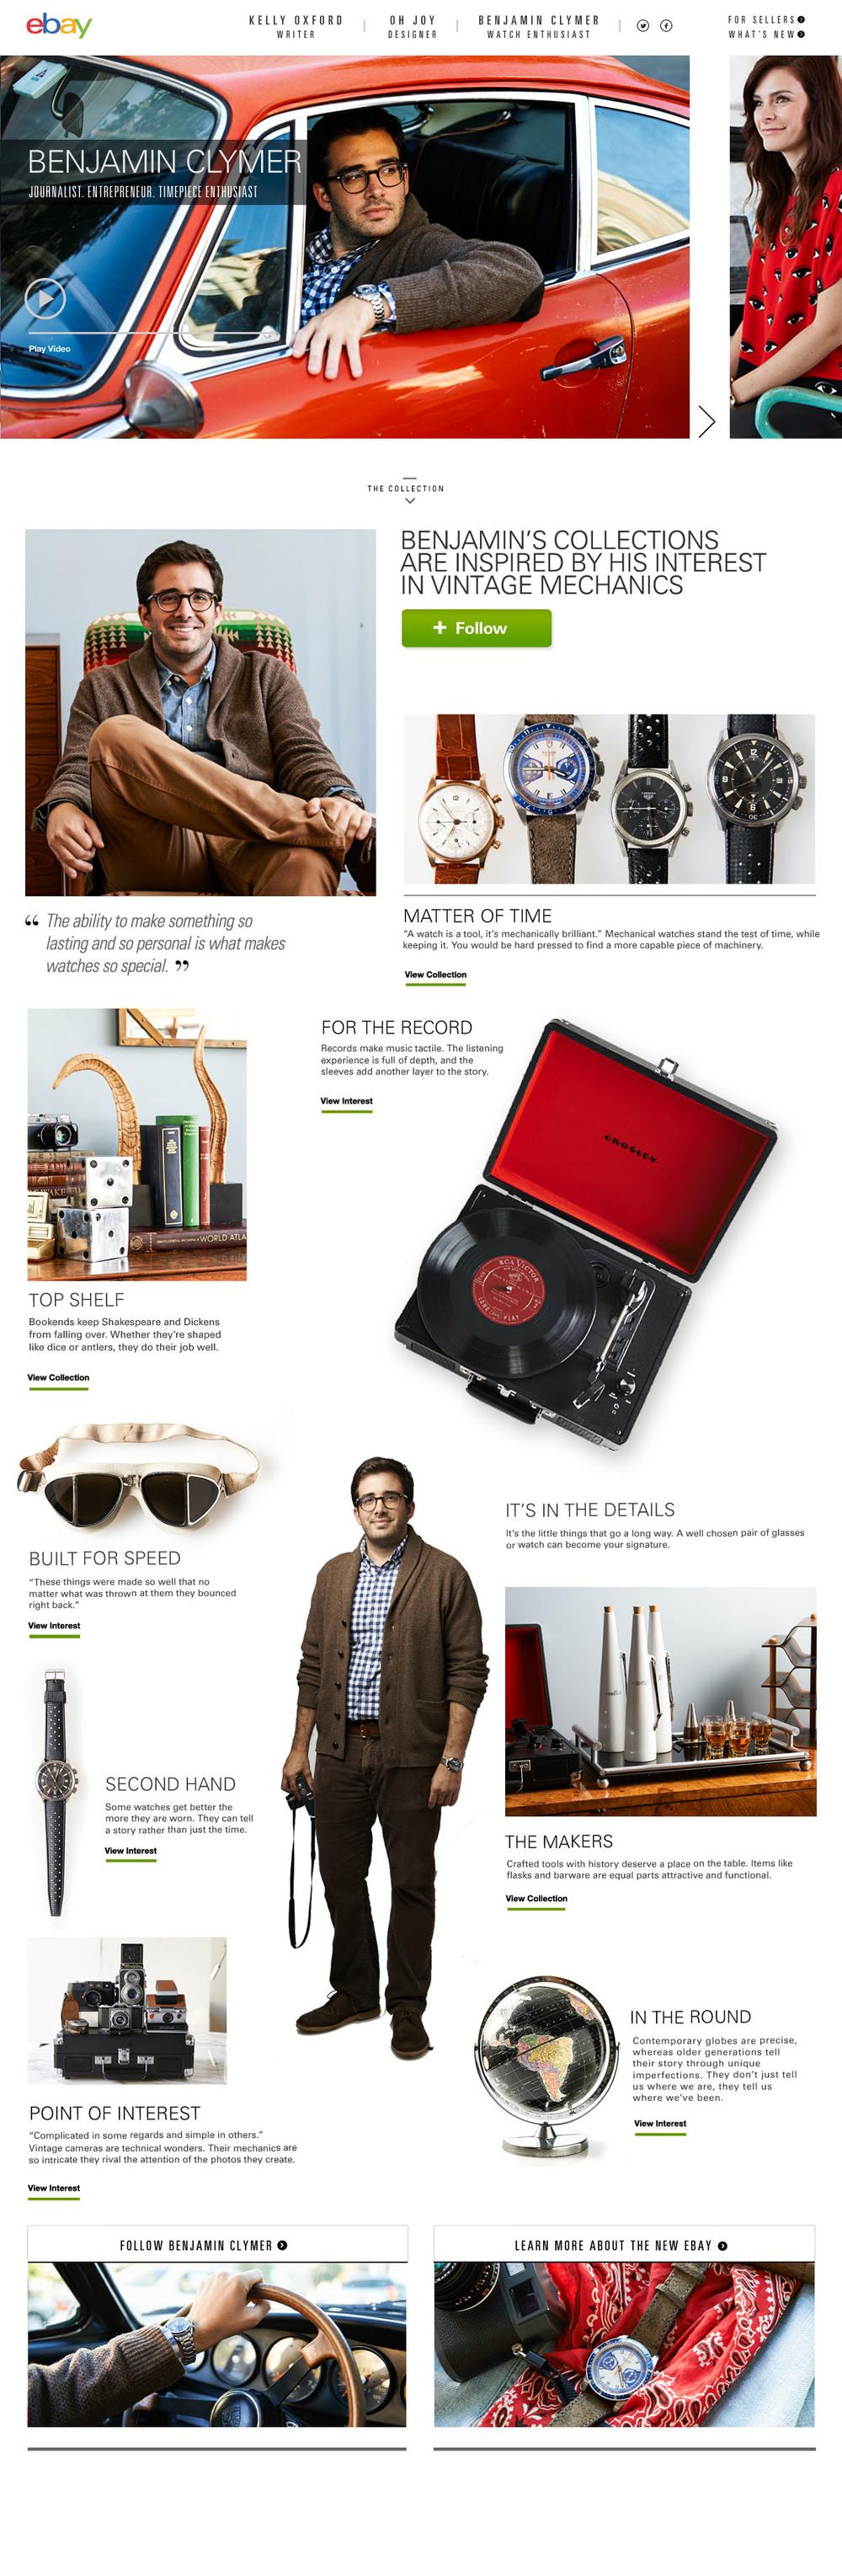 ebay 3 0 abby merea writer acd. Black Bedroom Furniture Sets. Home Design Ideas